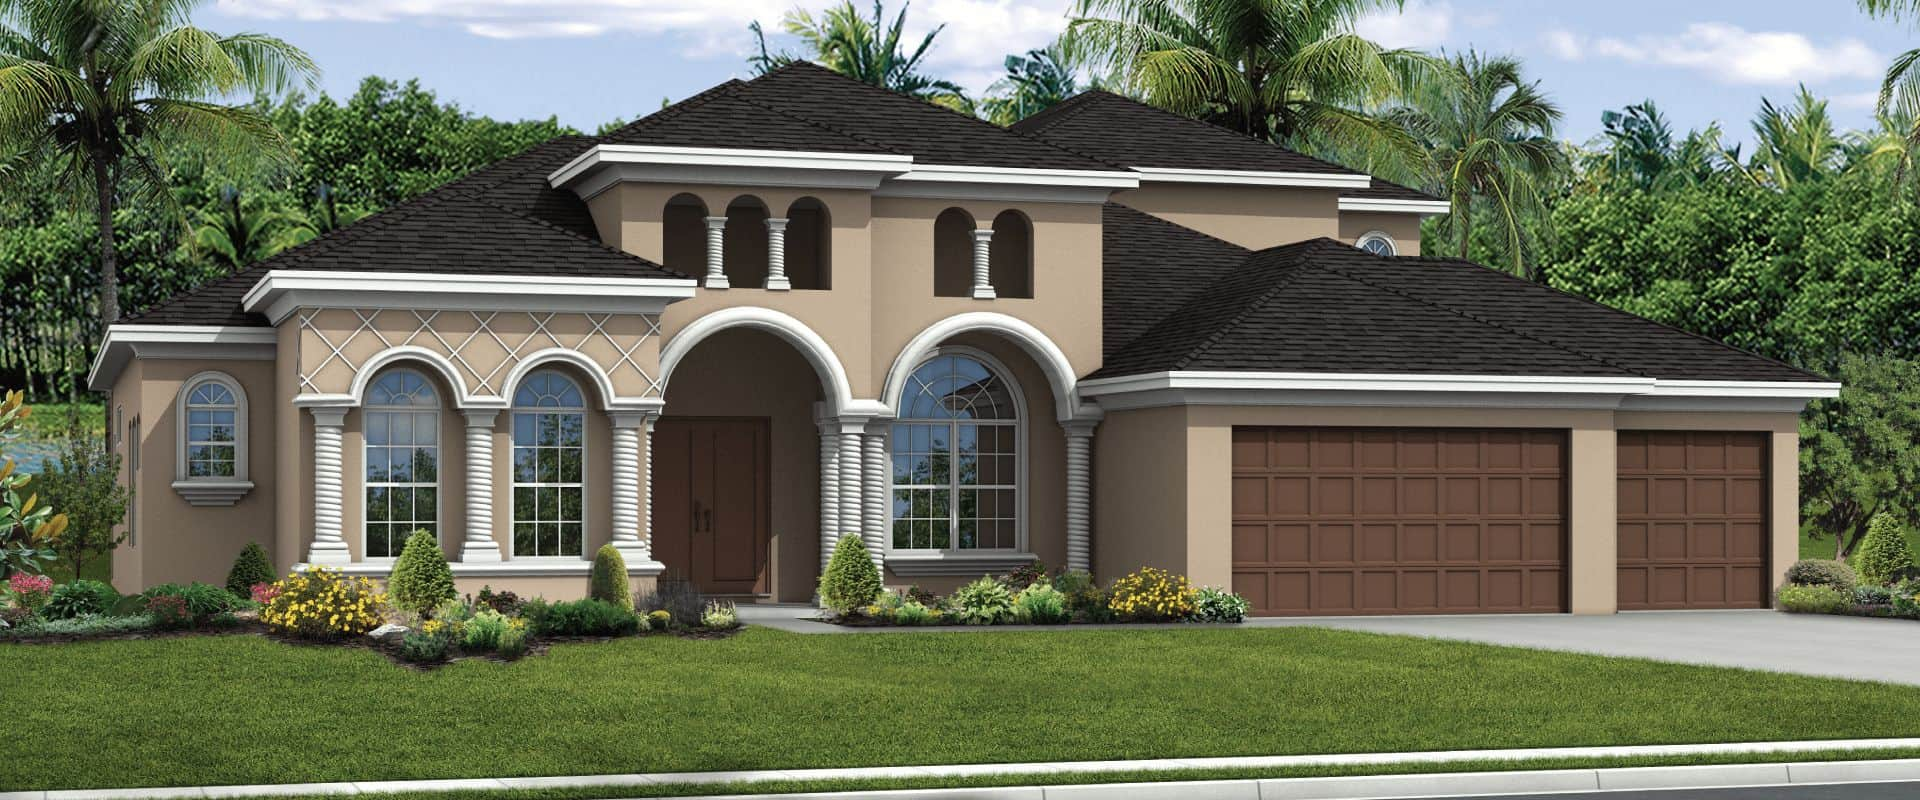 Home Builders hillsborough